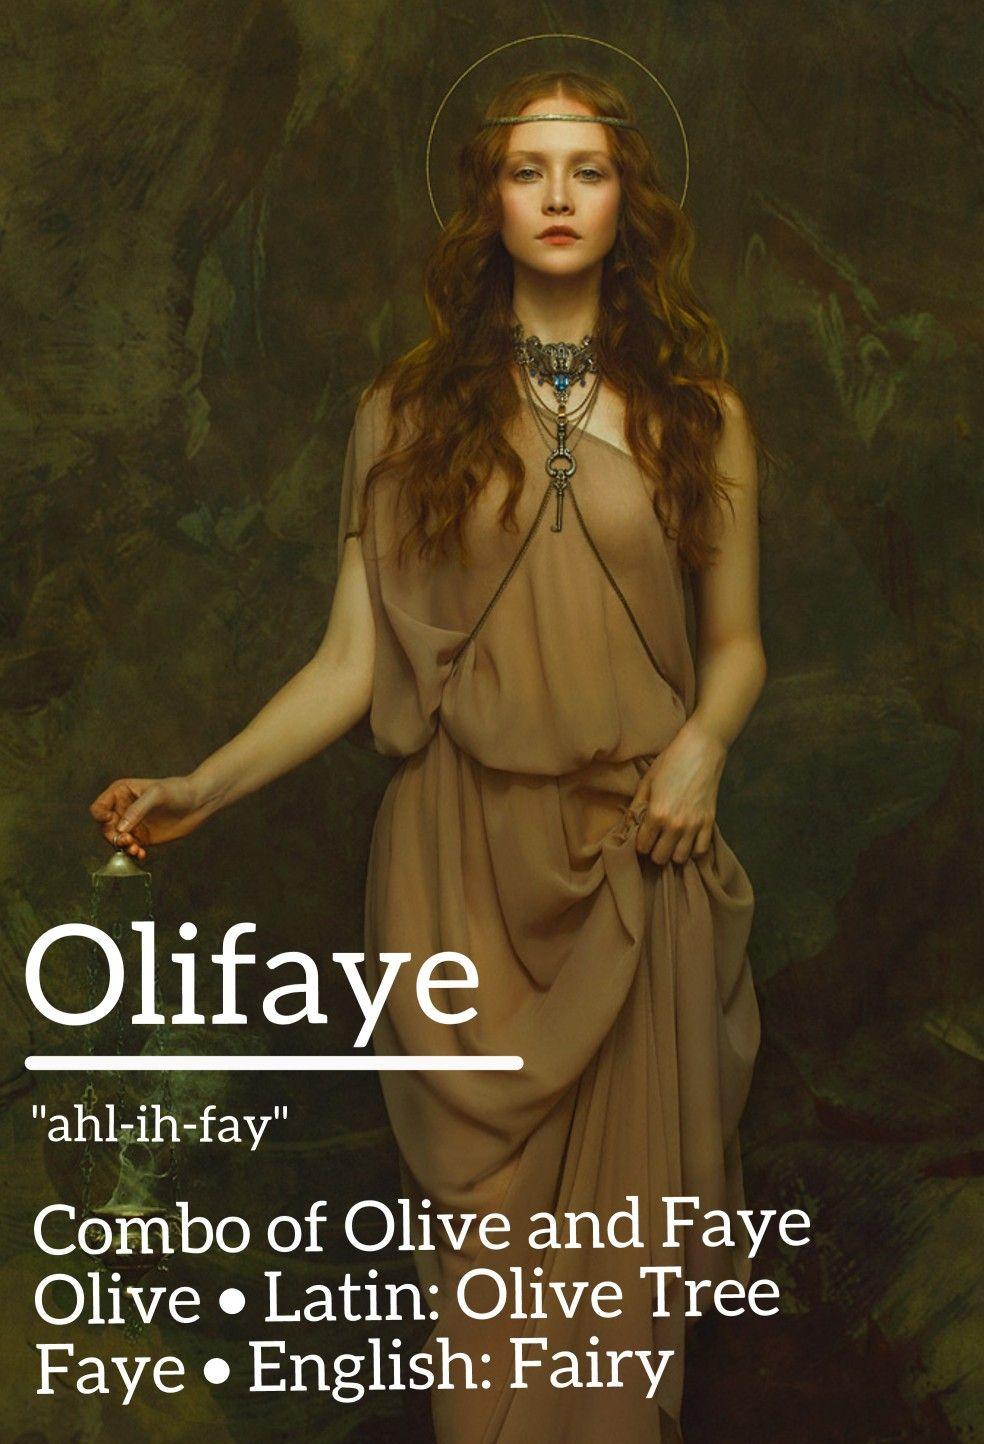 Combo of Olive and Faye - Olive > Latin: Olive Tree / Faye